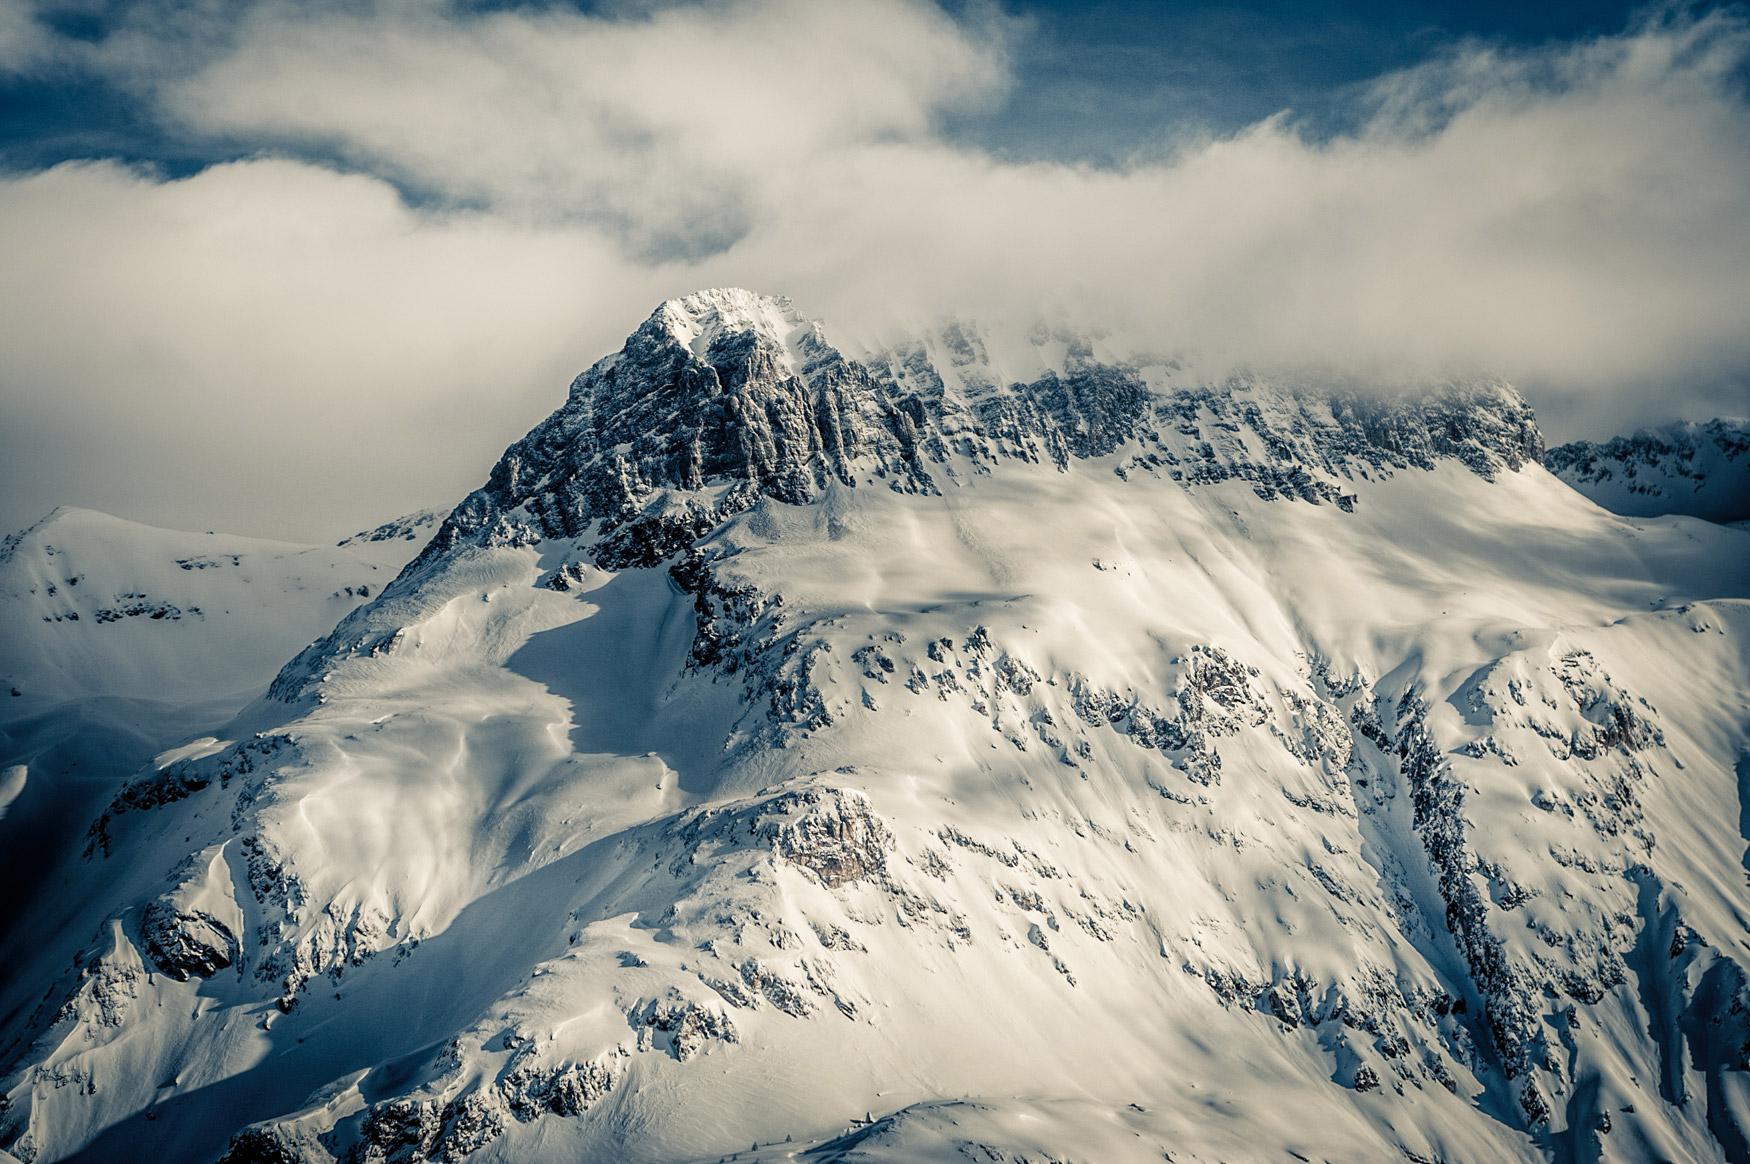 Mountains_ValDIsere_2013FEB-3662.jpg